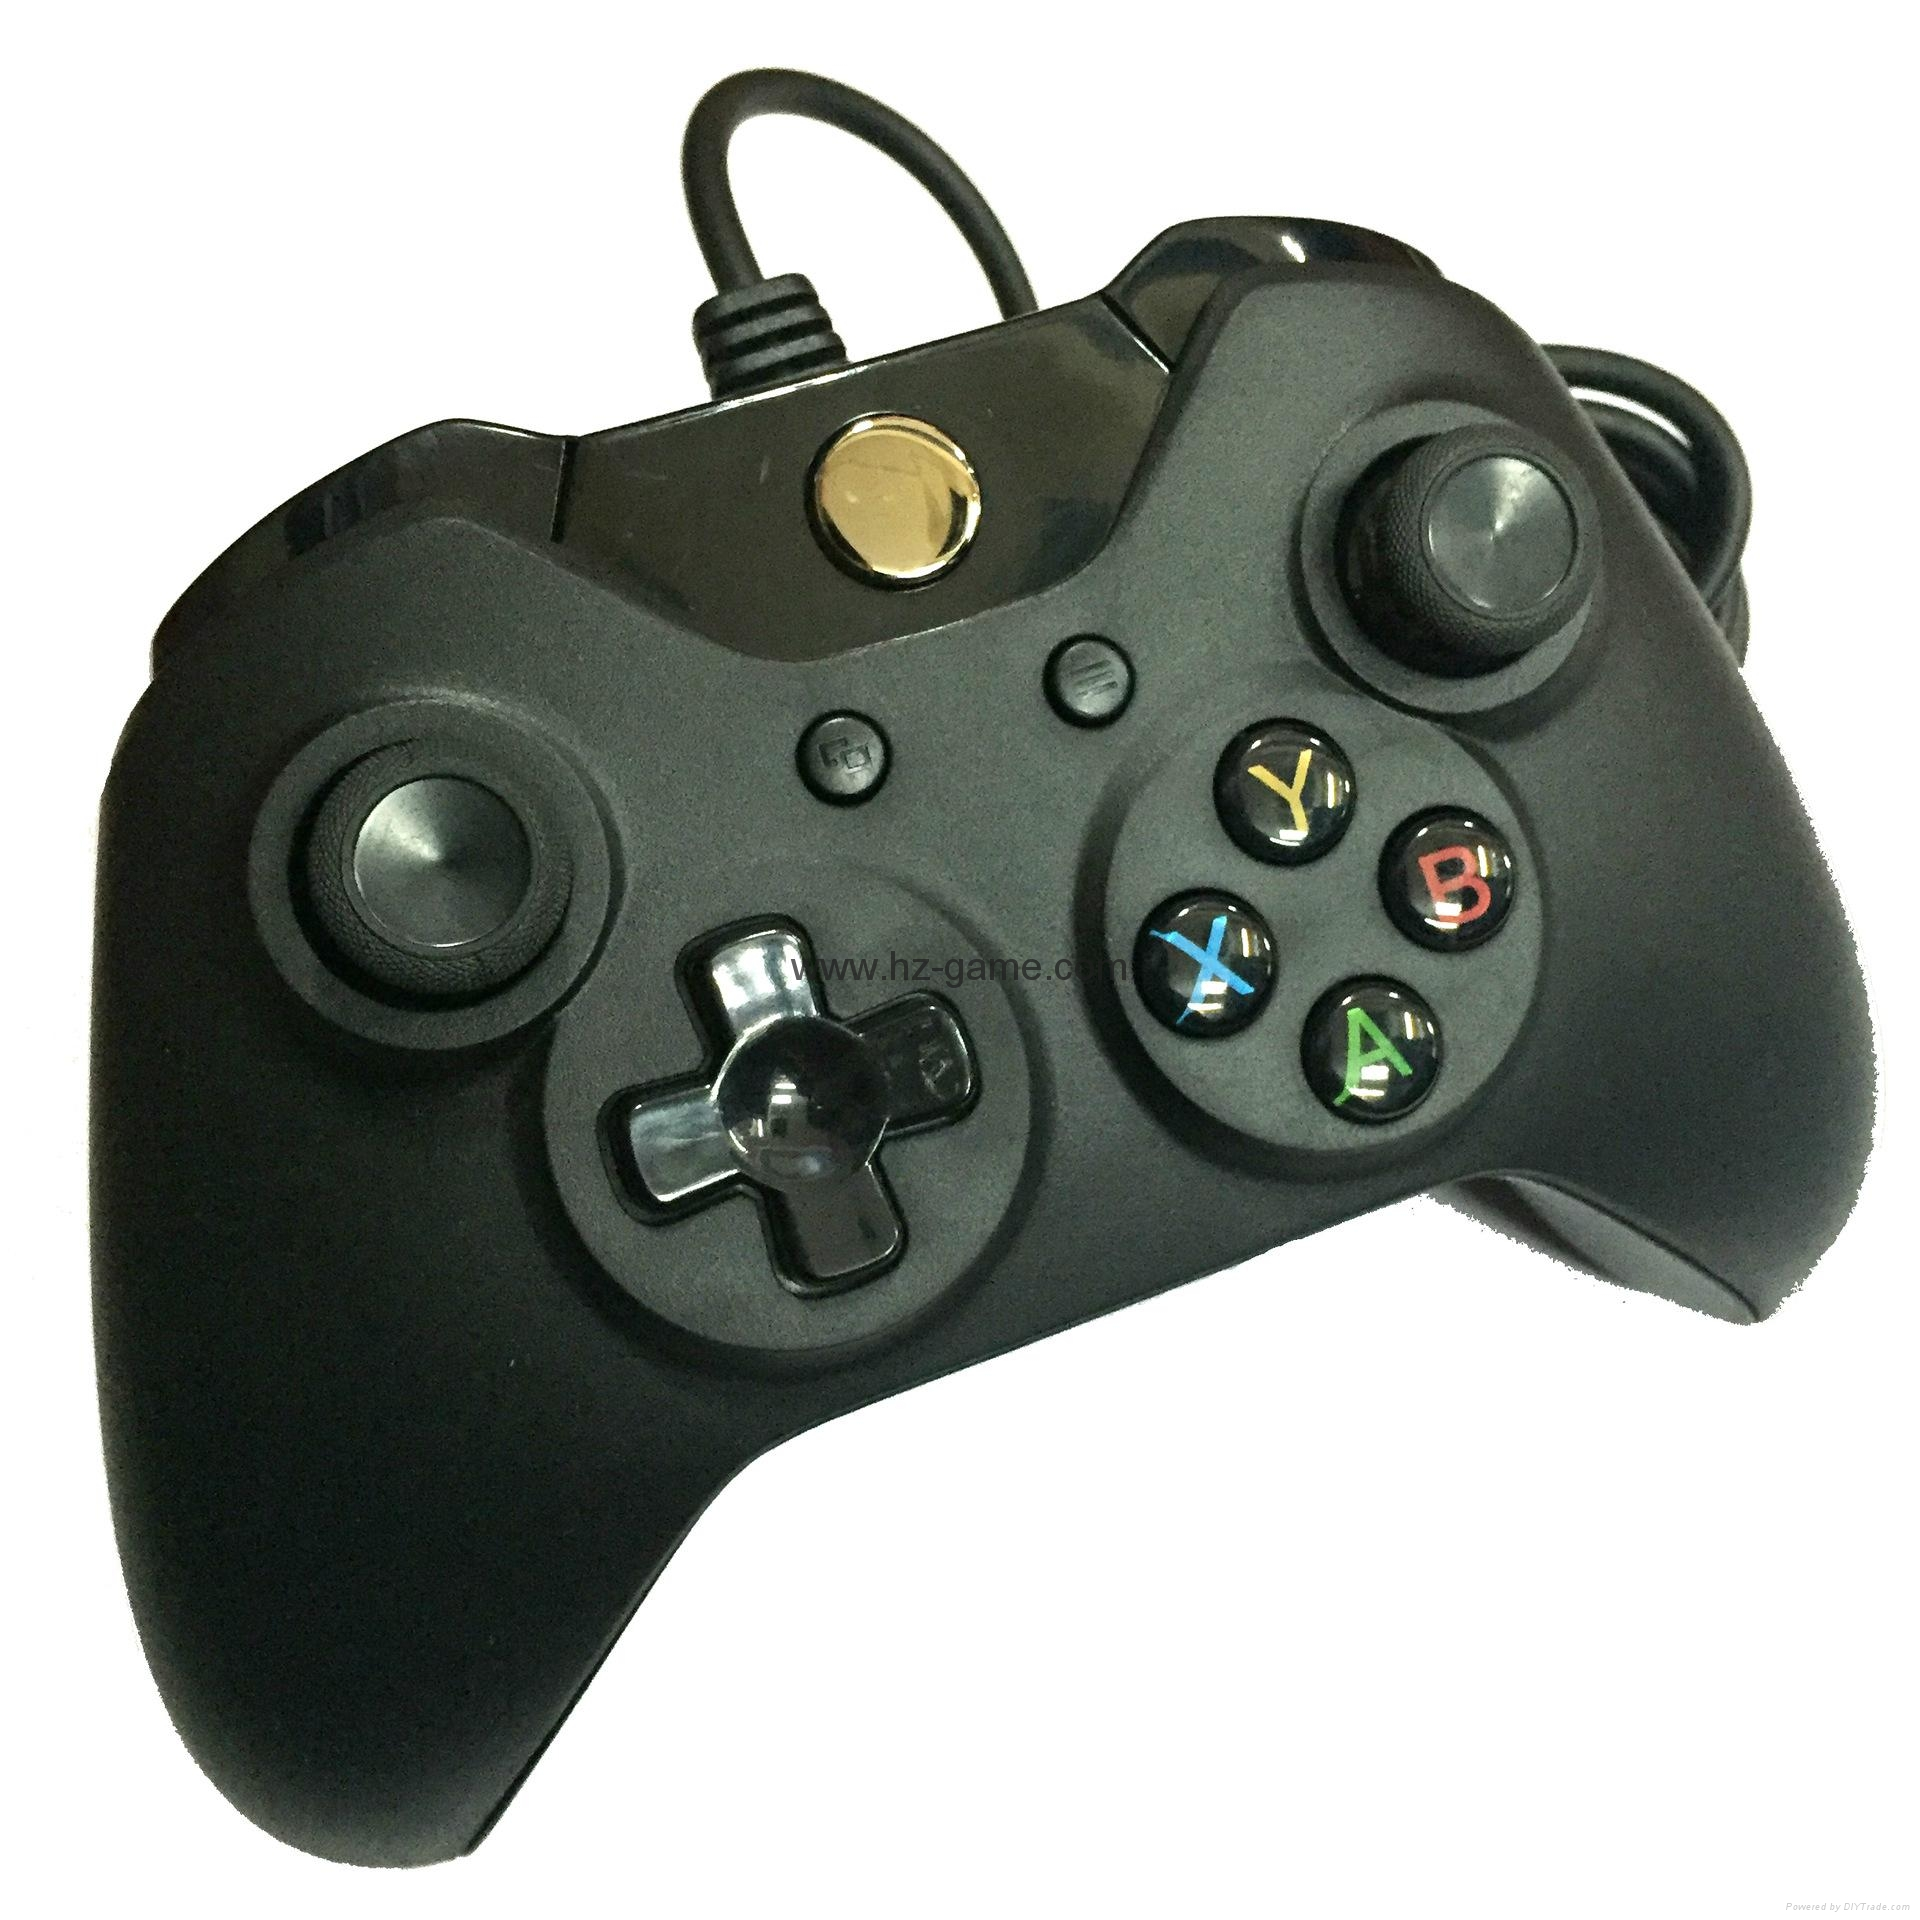 XBOX ONE Wireless Controller,XBOX One wired Controller,xboxone gamepad joystick 20